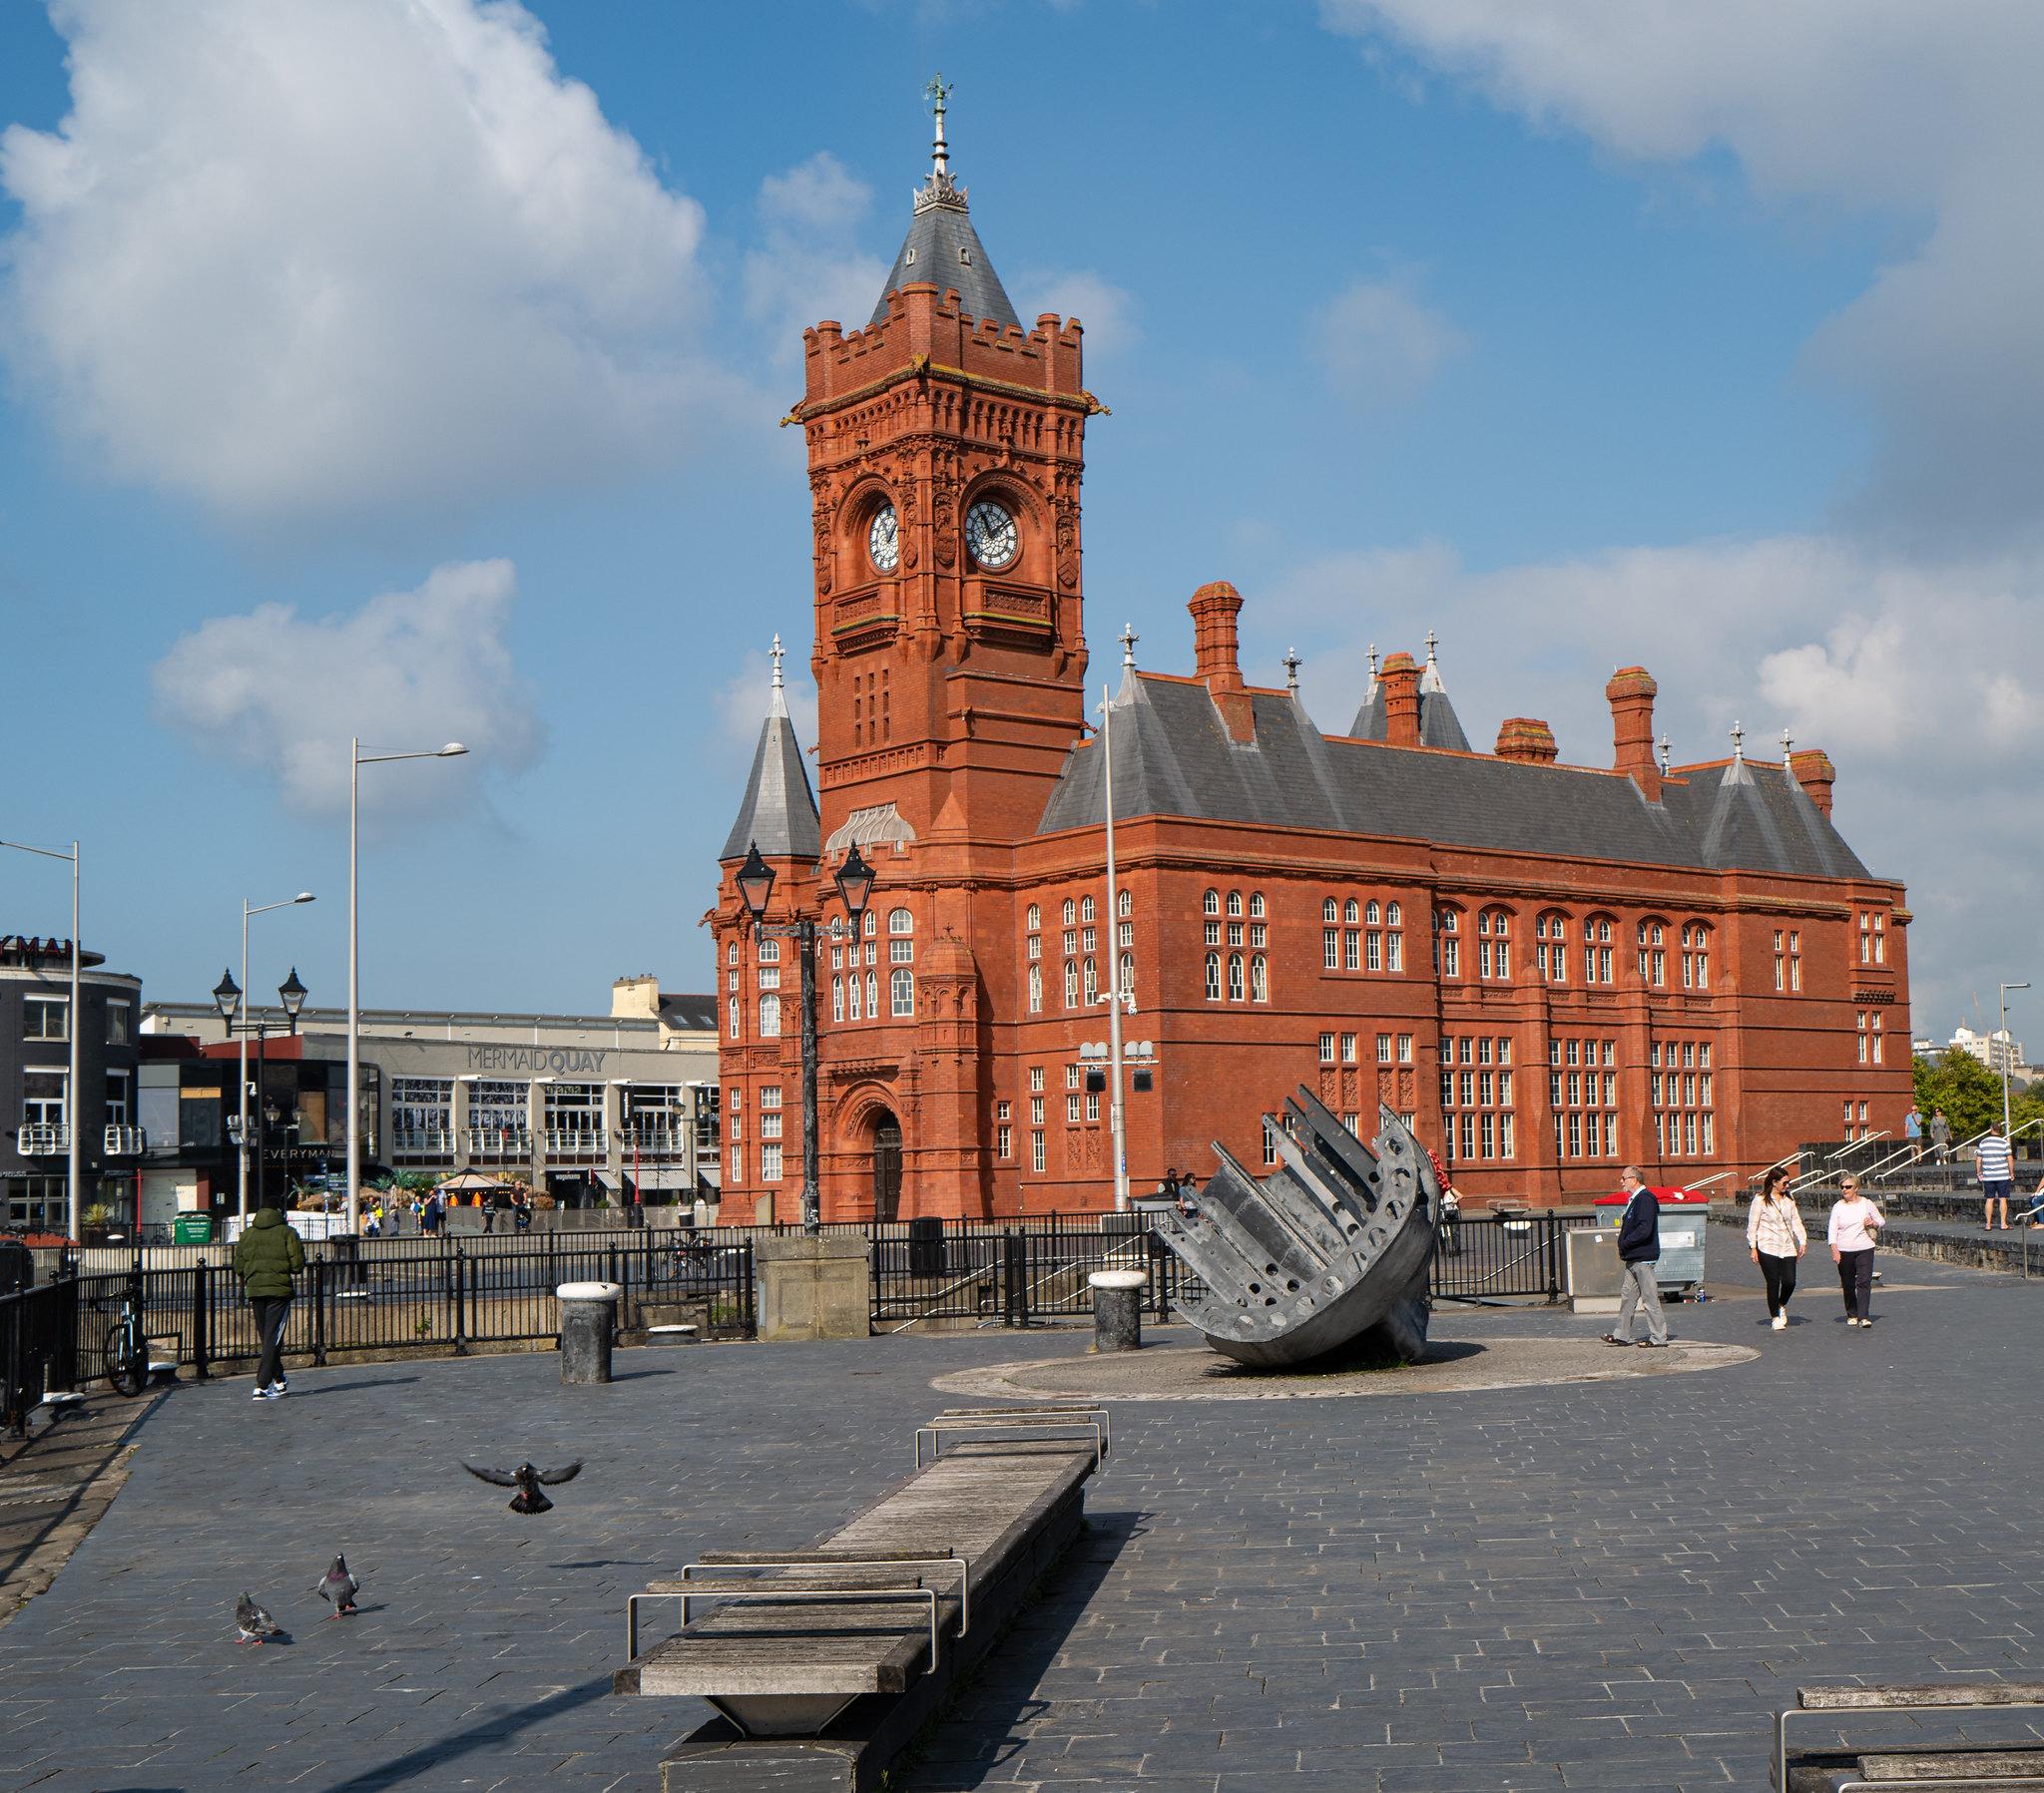 Pierhead building - Cardiff